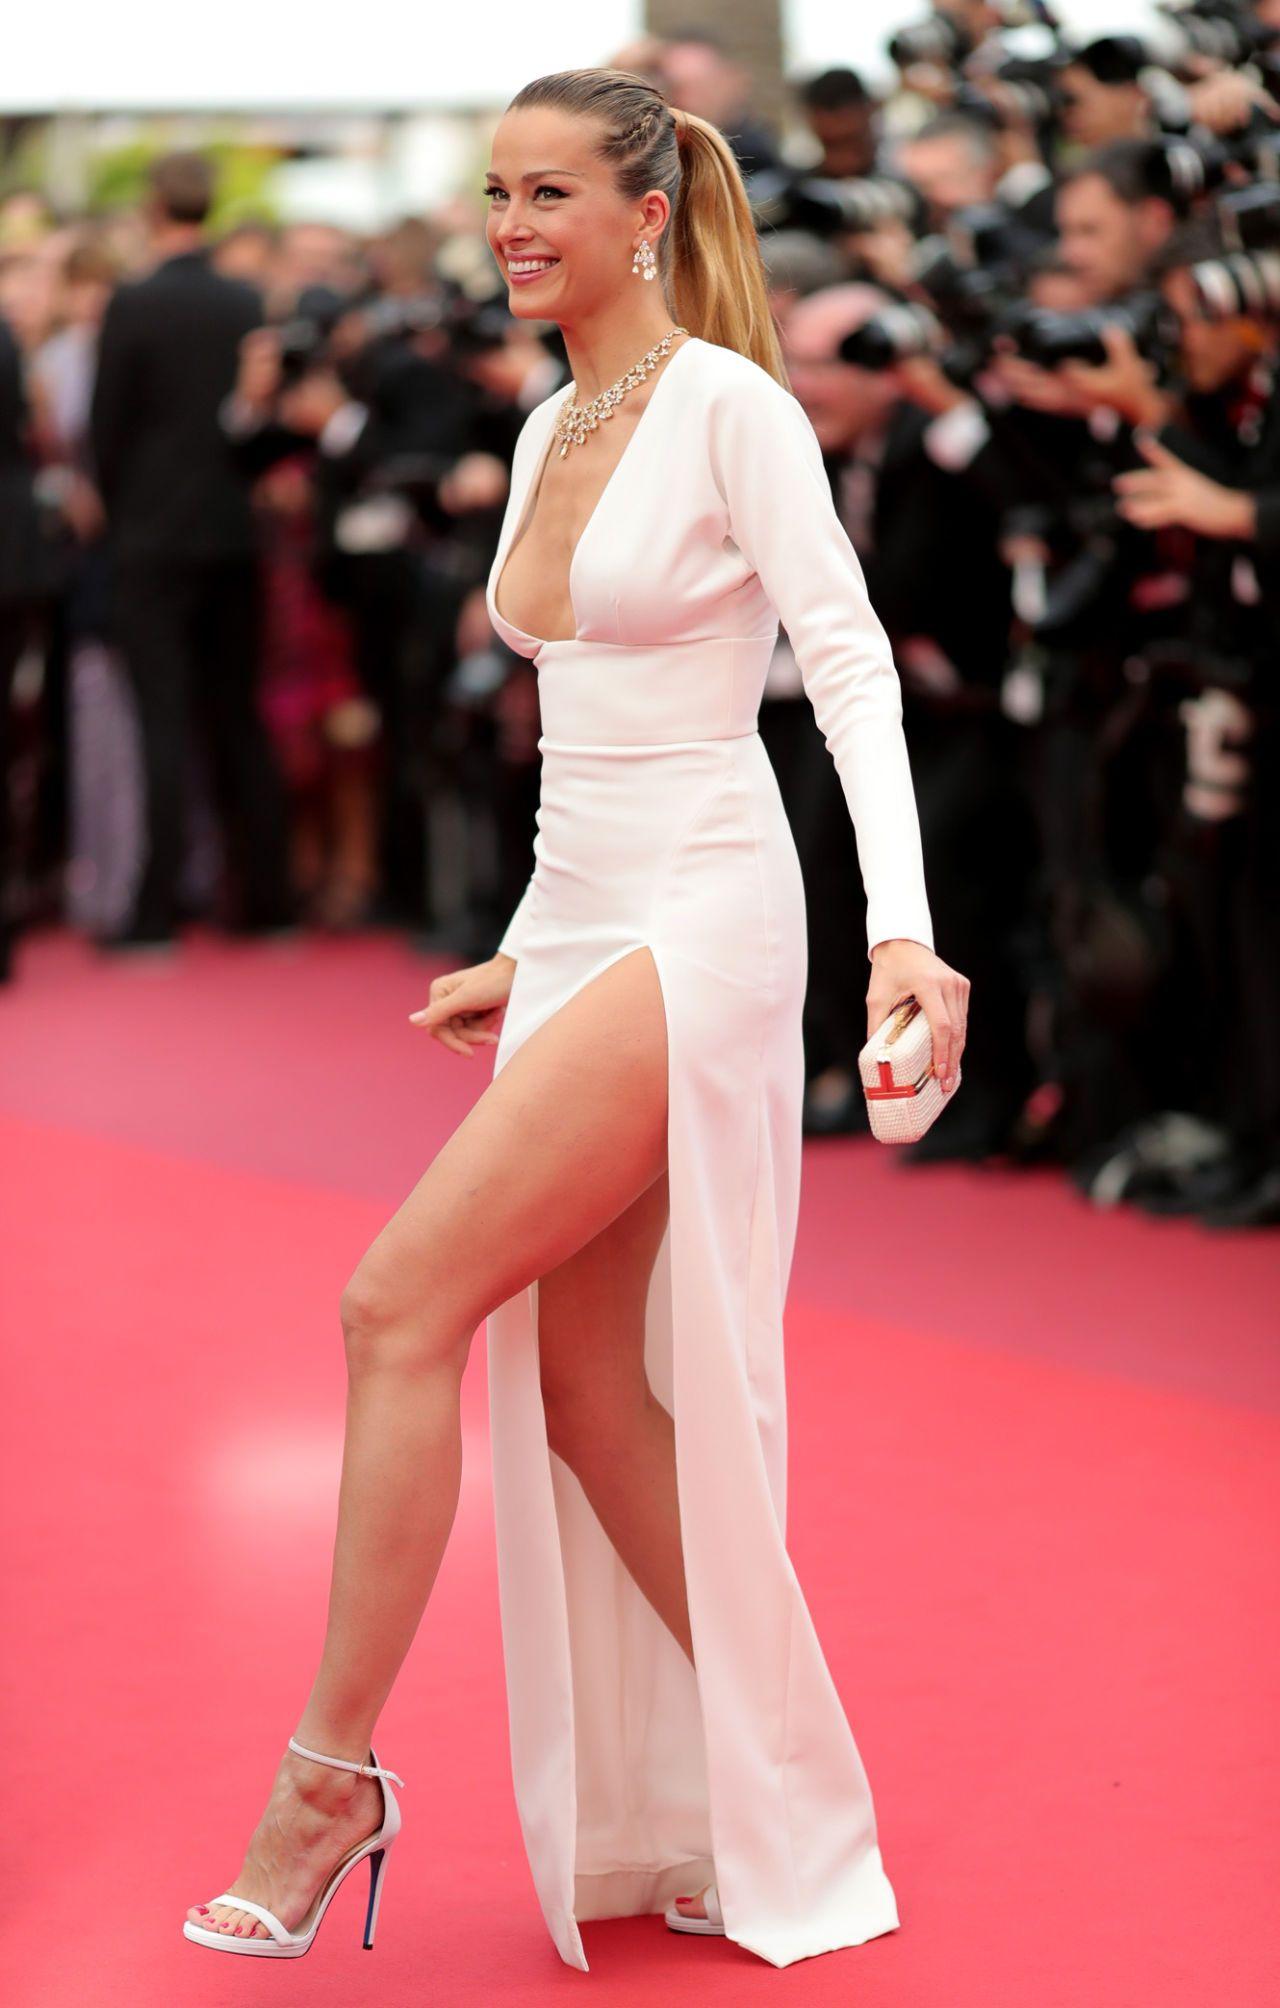 Celebrites Petra Nemcova nude (74 foto and video), Ass, Paparazzi, Boobs, in bikini 2018